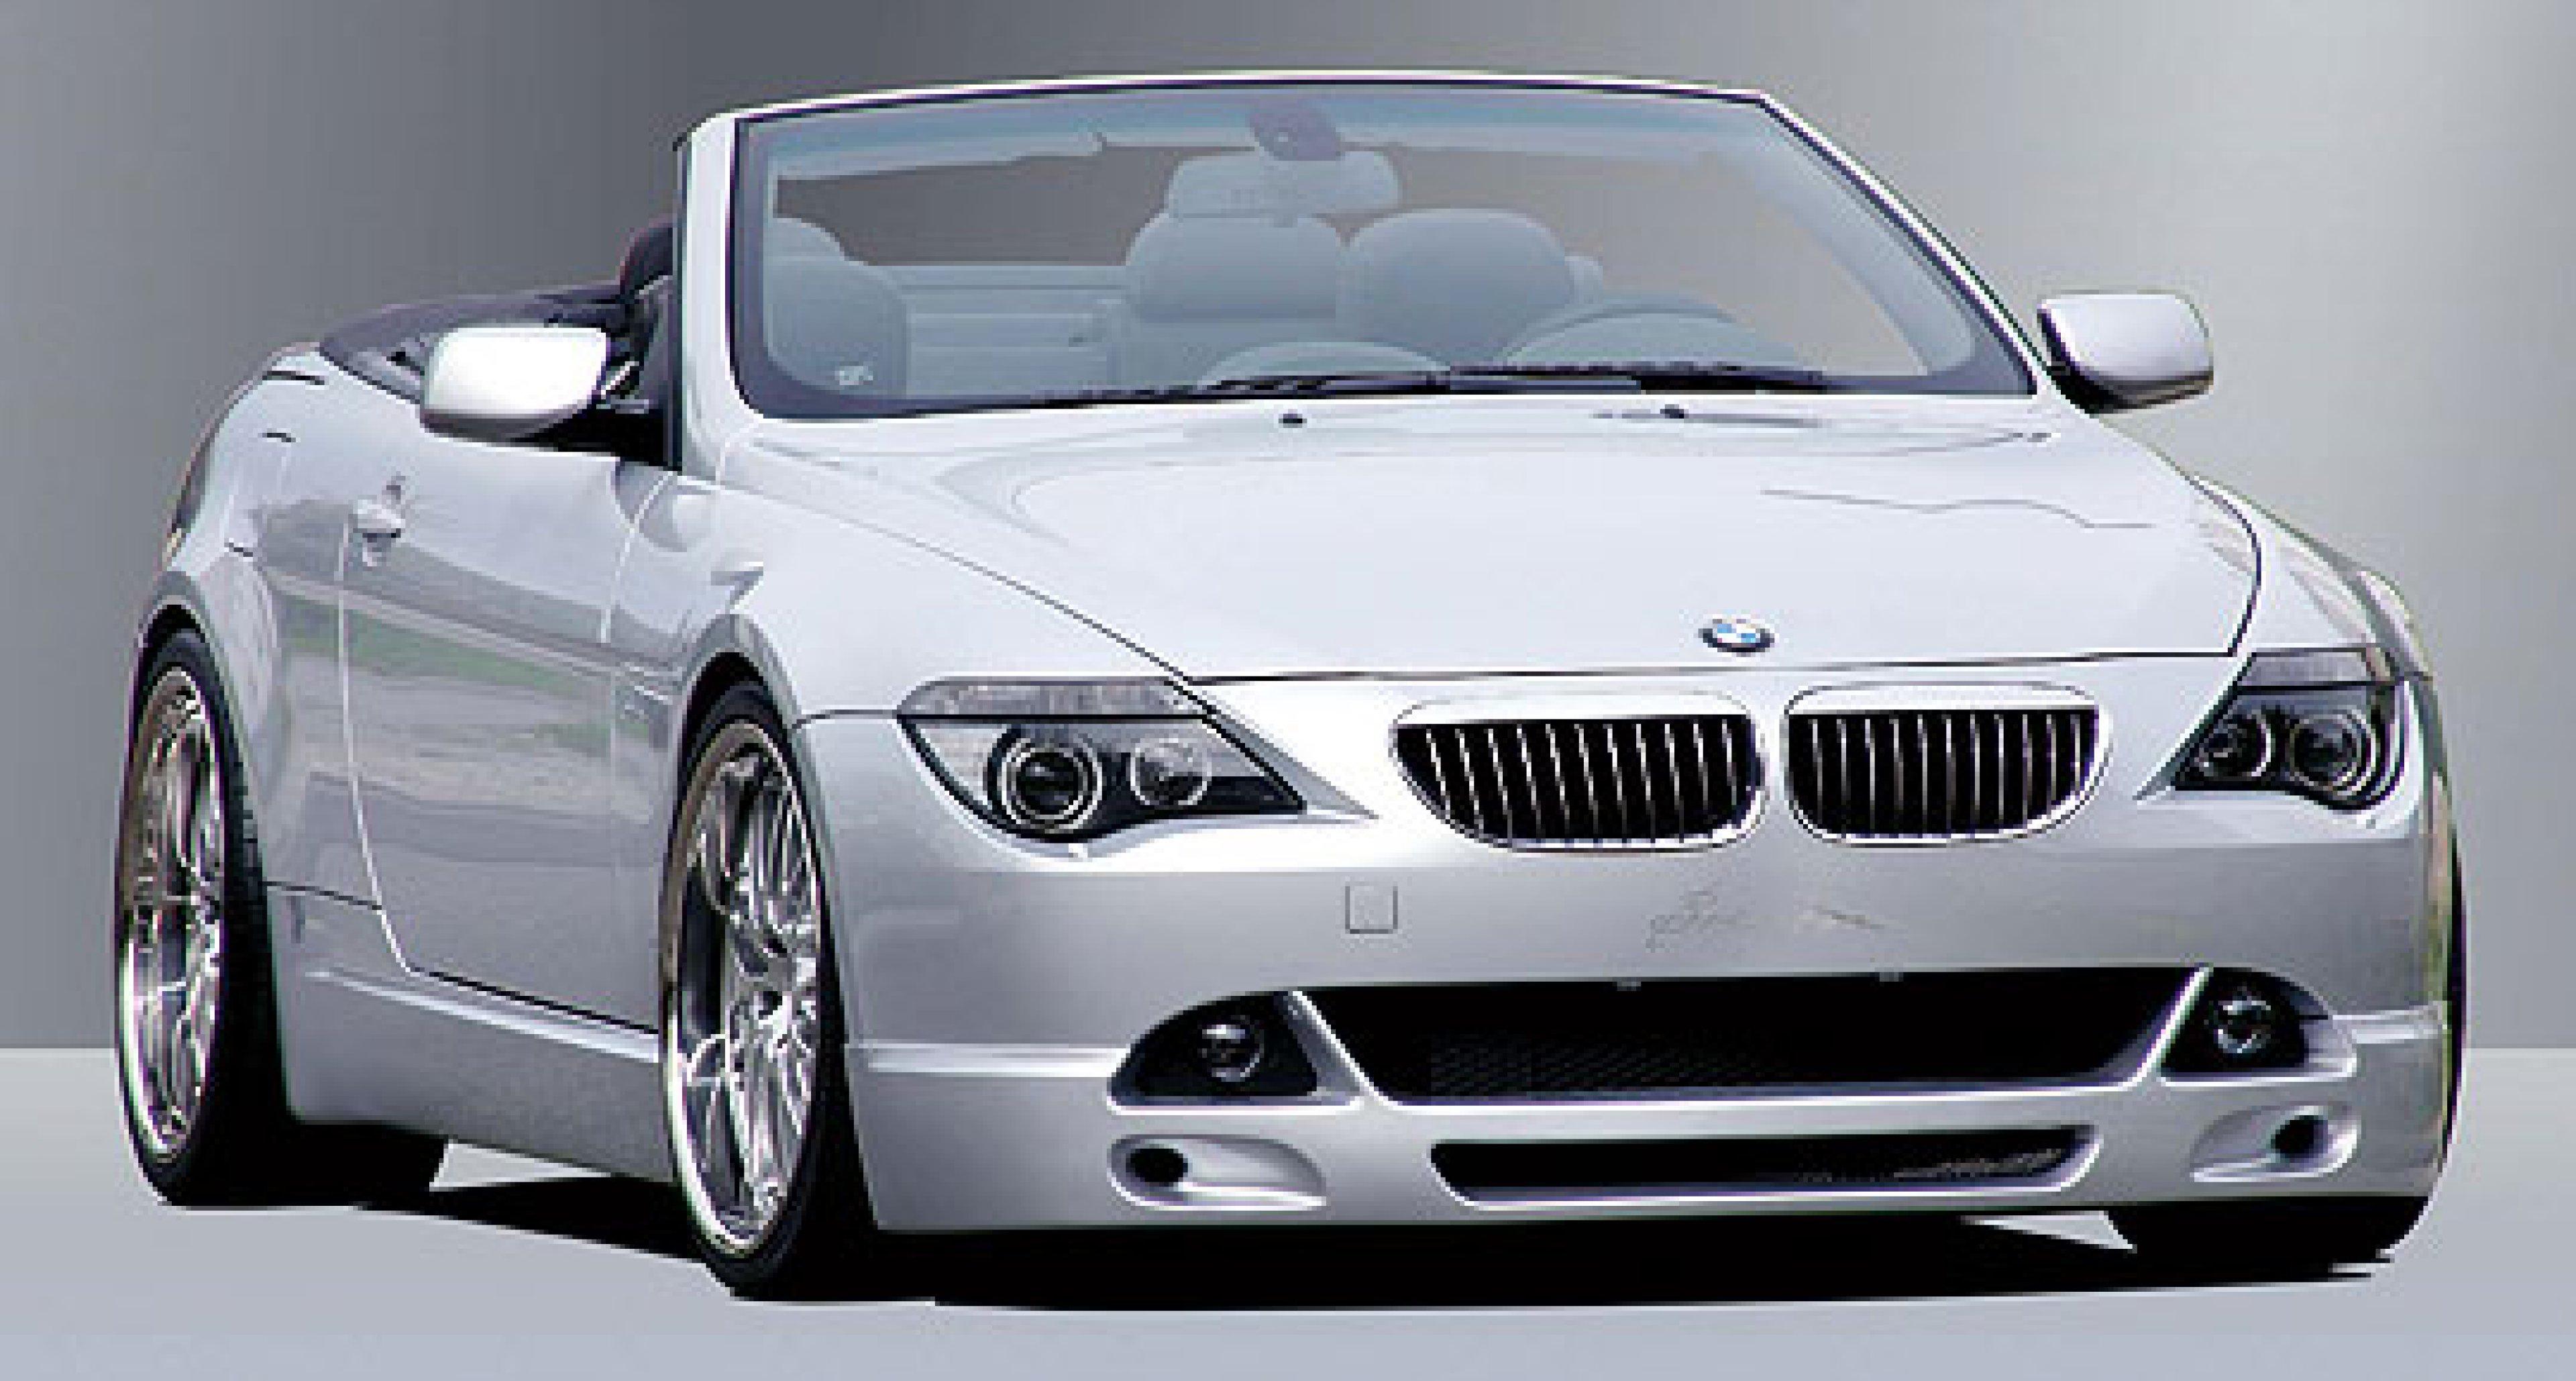 BMW 645Ci Cabrio: Tailormade by Breyton